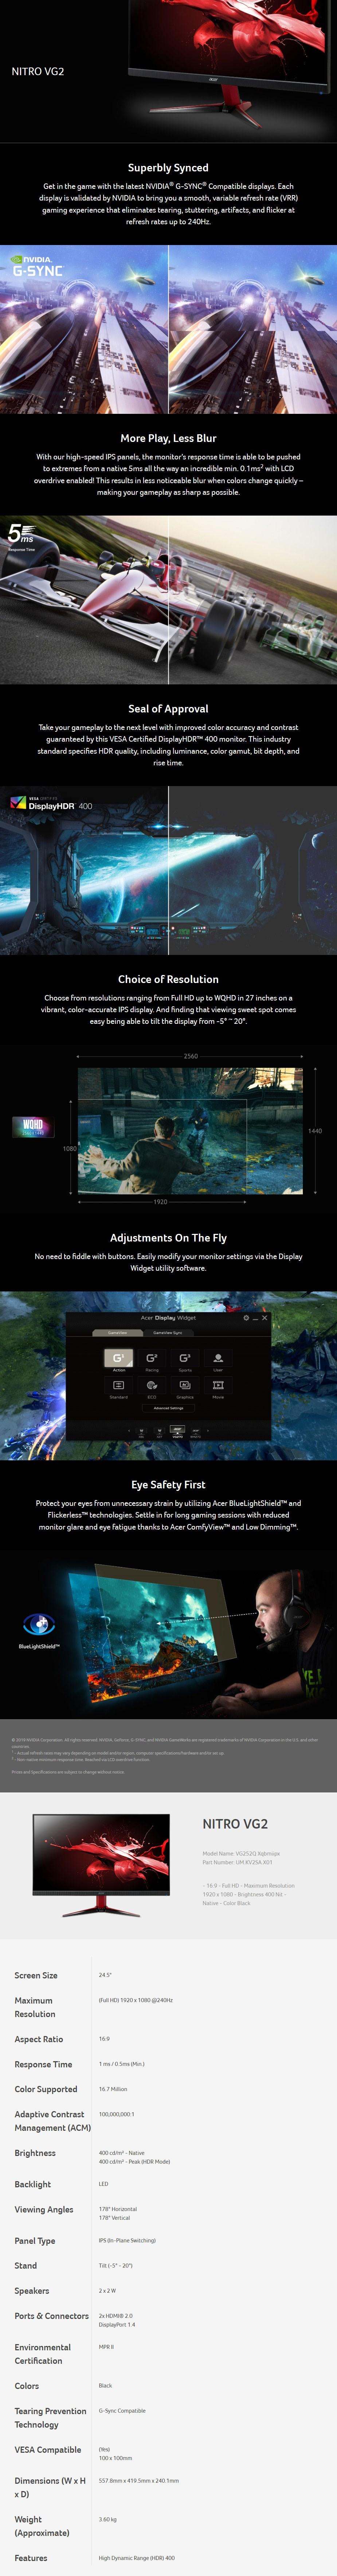 acer-nitro-vg252qx-245-240hz-fhd-hdr-gsync-compatible-ips-gaming-monitor-ac32463-1.jpg